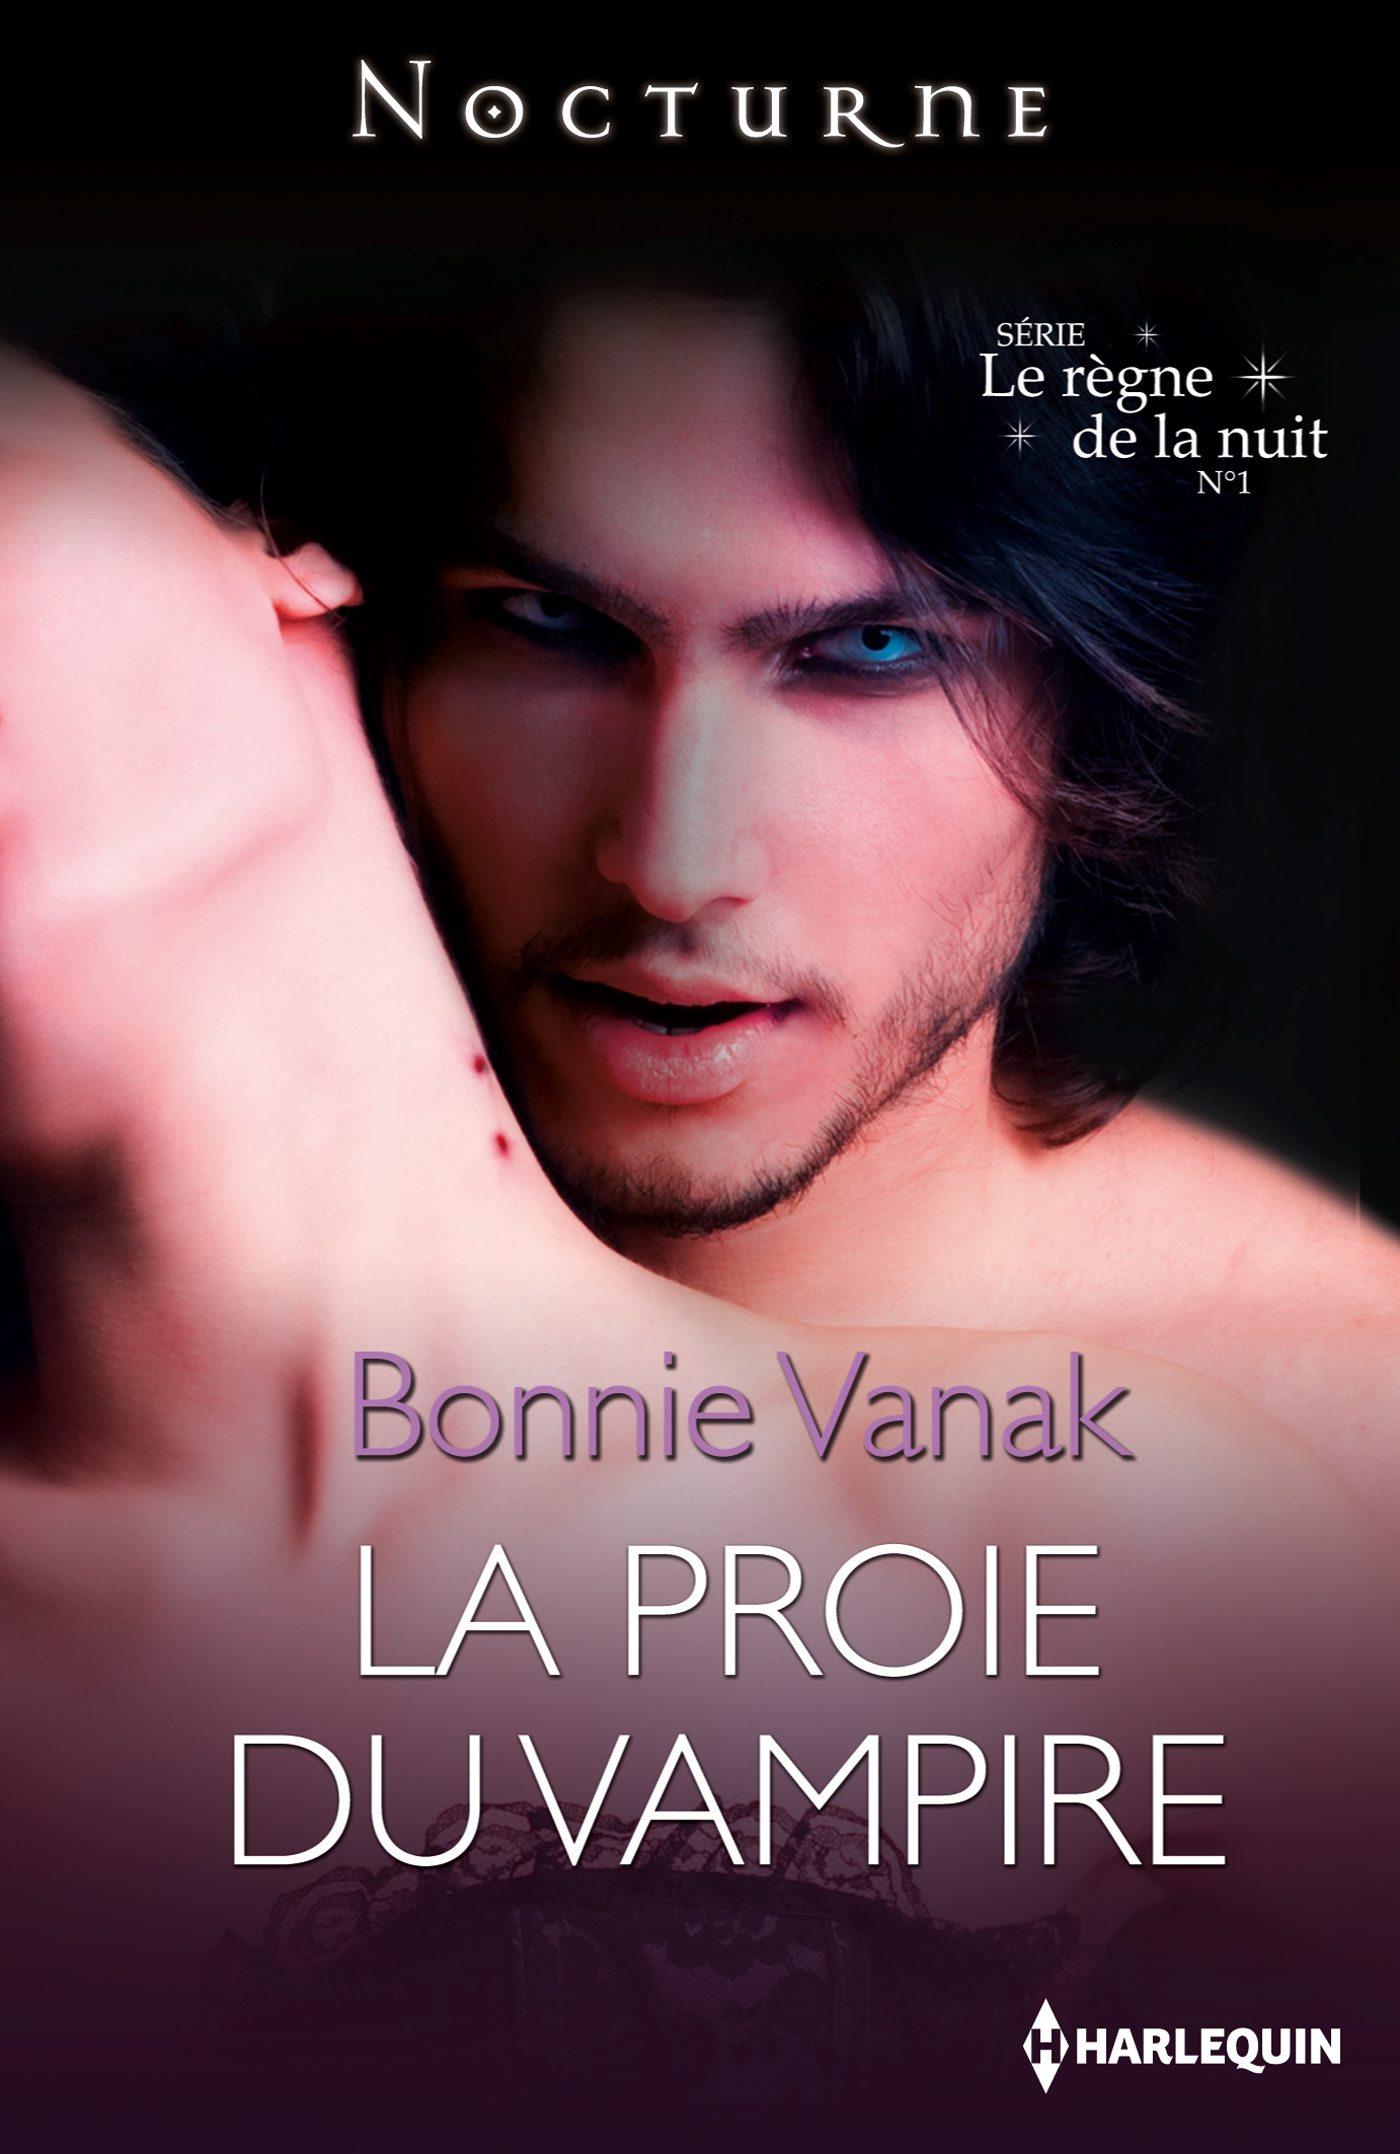 Livres De Vampire Romantique Editeur De Pdf Eselnera Tk